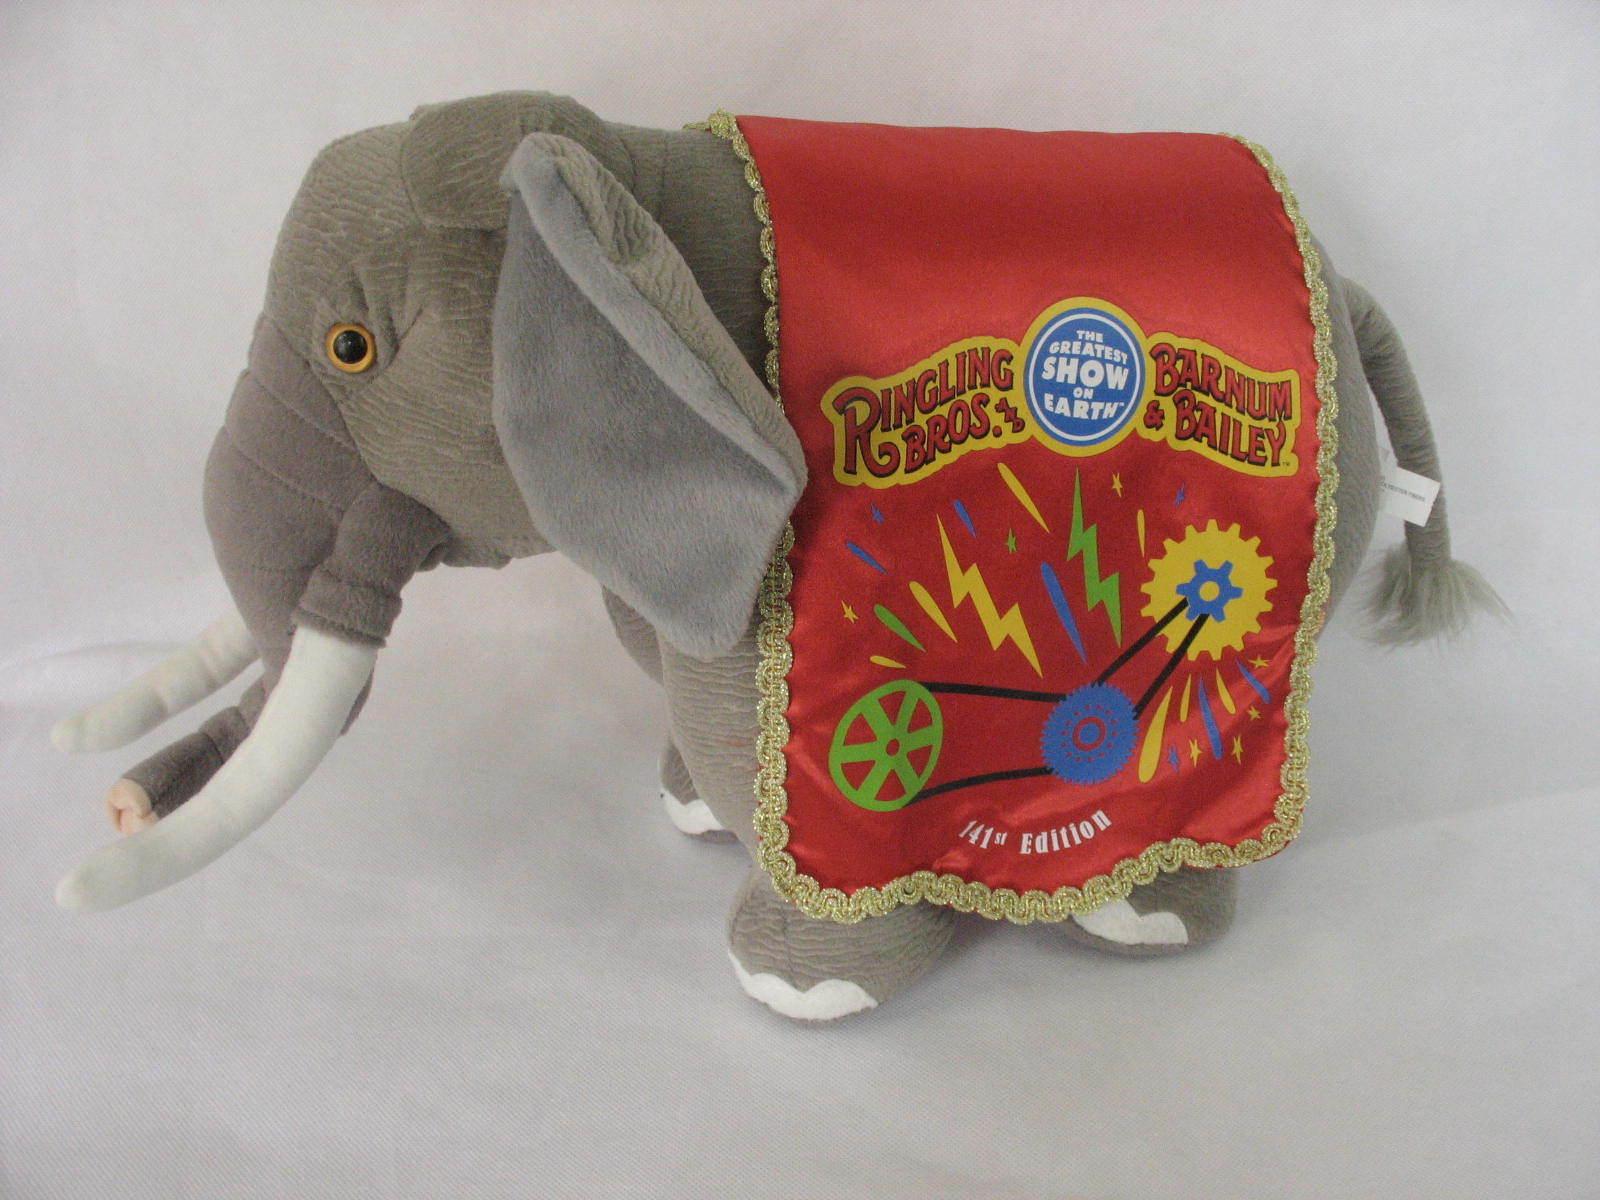 Ringling Bros Barnum and Bailey 141st Edition Circus Elephant Stuffed Plush